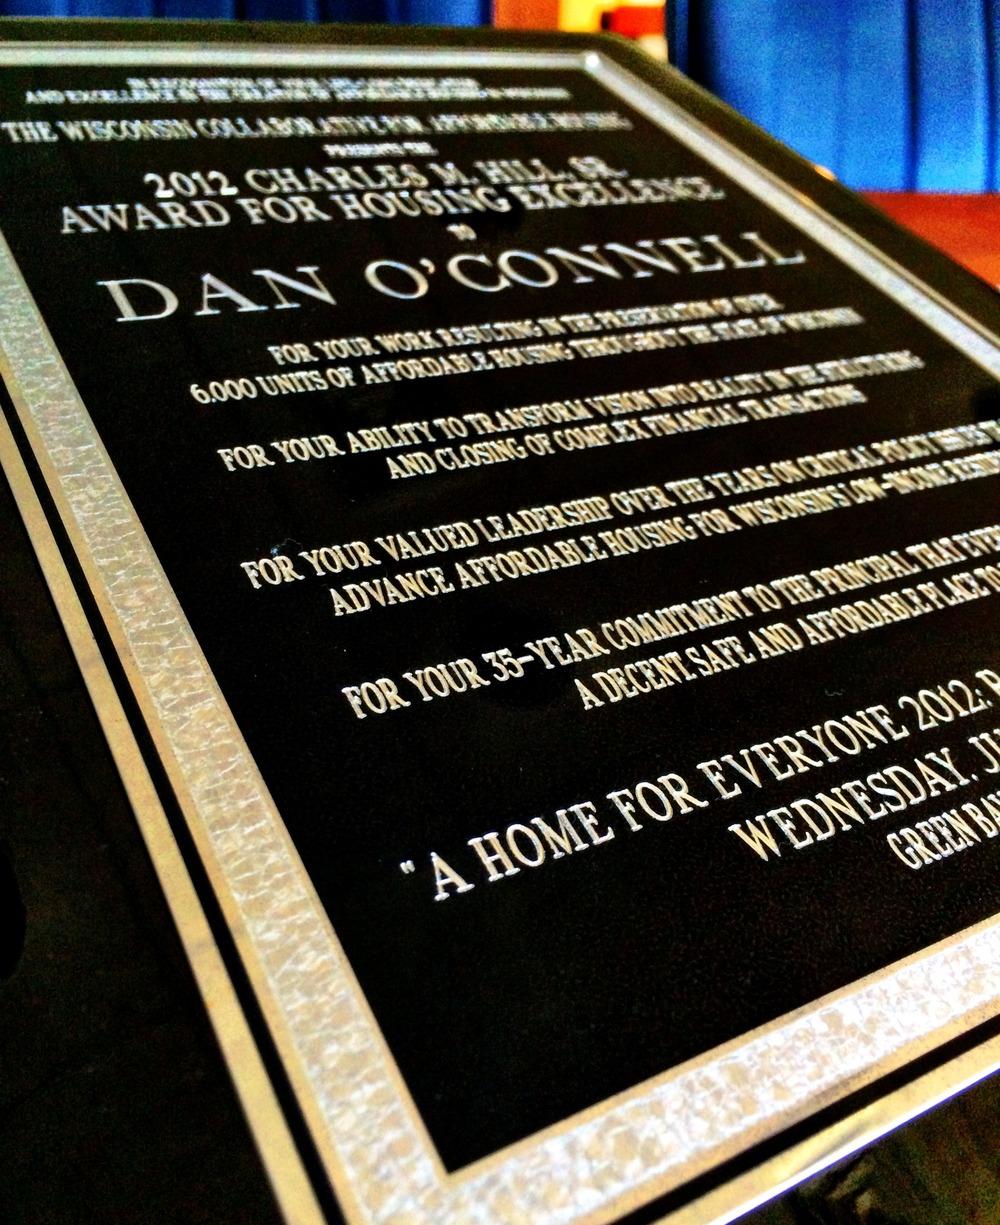 2012 Charles M. Hill, Sr. Award